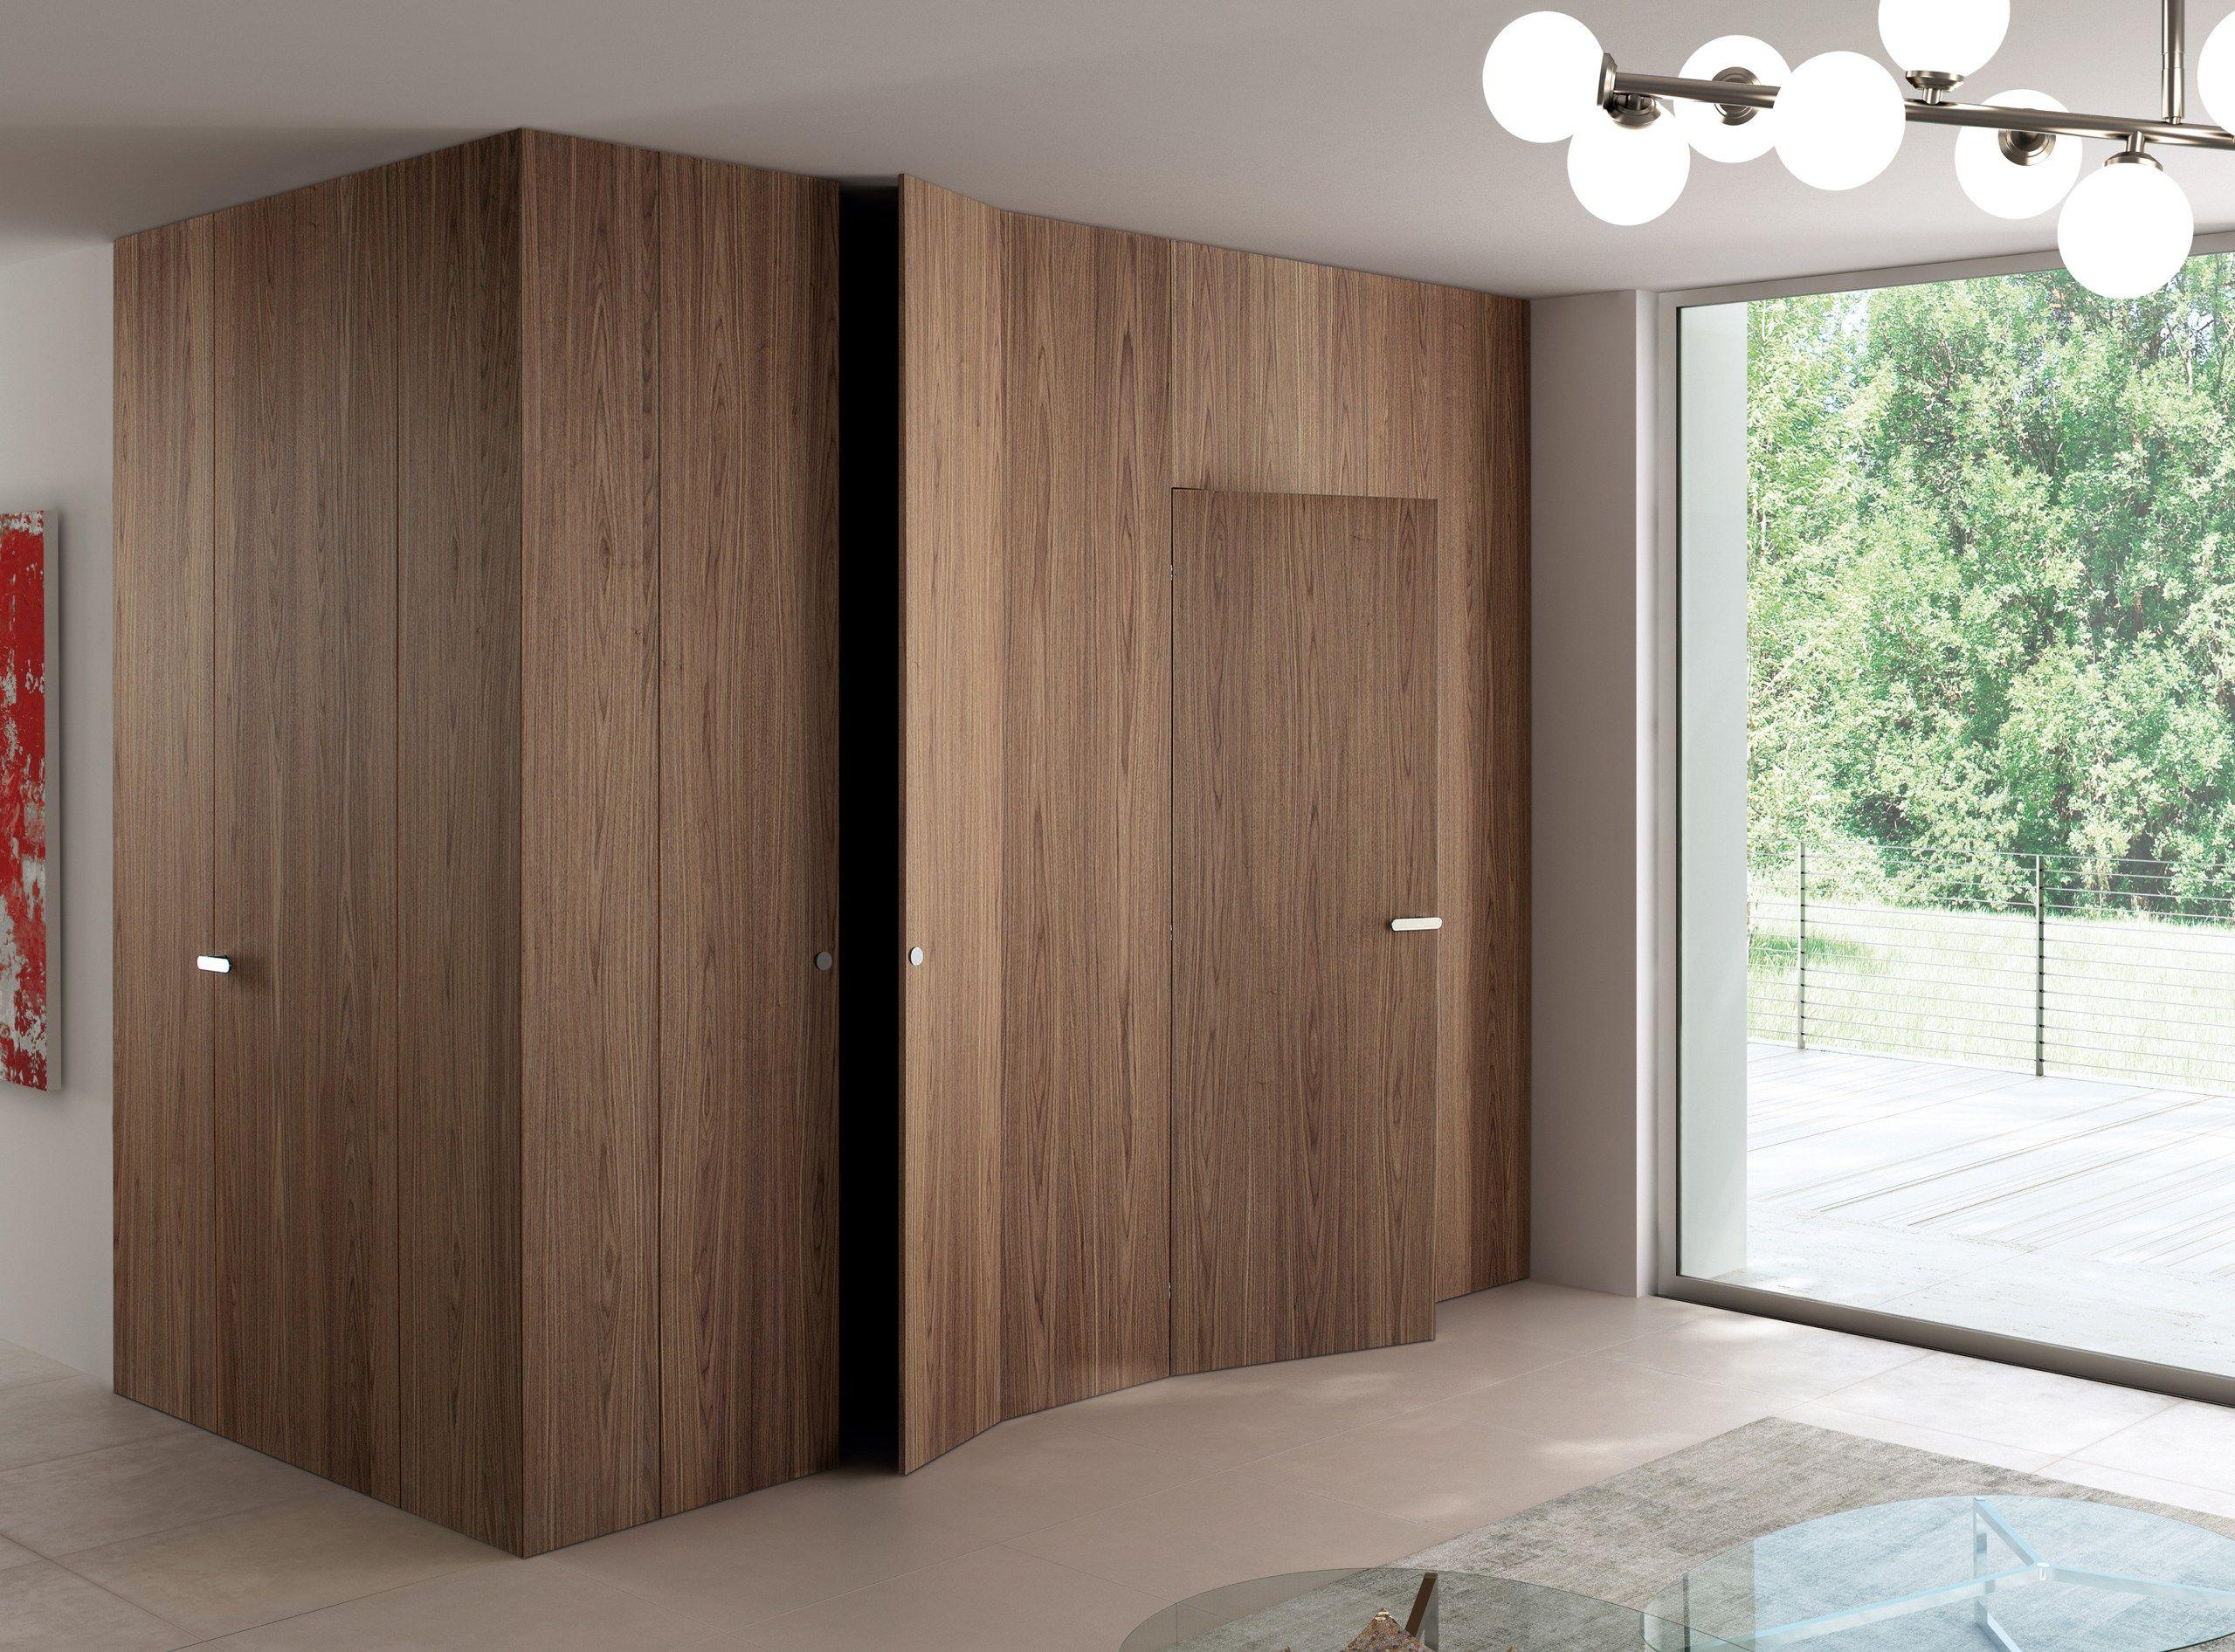 Boiserie porta in legno infinity system tabula by ghizzi for Porte xinnix